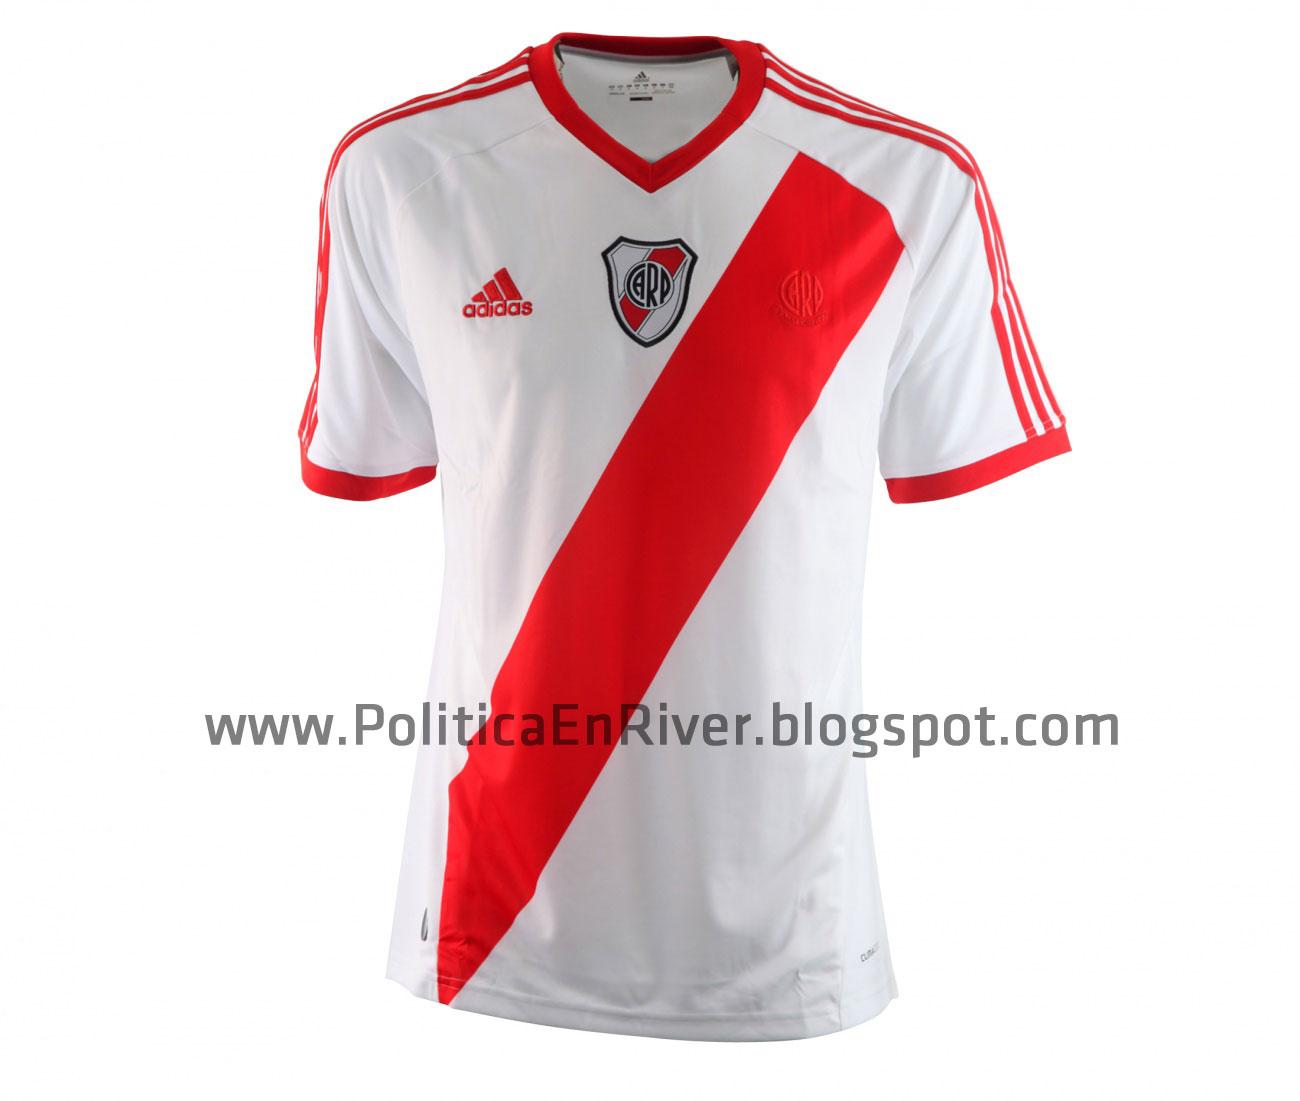 Politica en River  Nueva Camiseta River Plate 2010 9804e138167b2